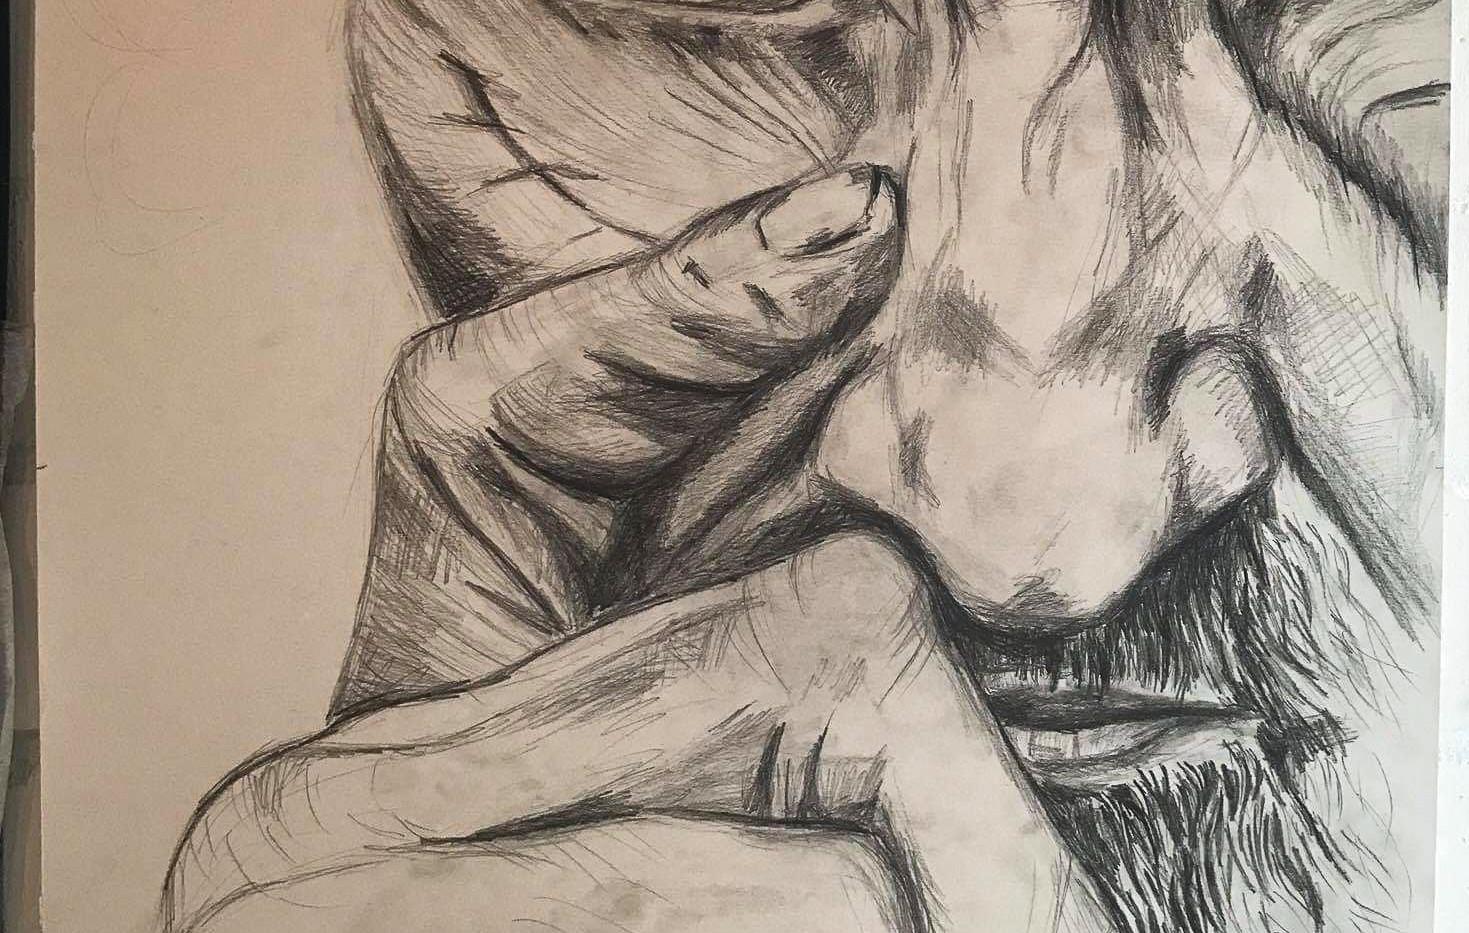 elena-gontcharova-drawing-meneerte-2.0.j